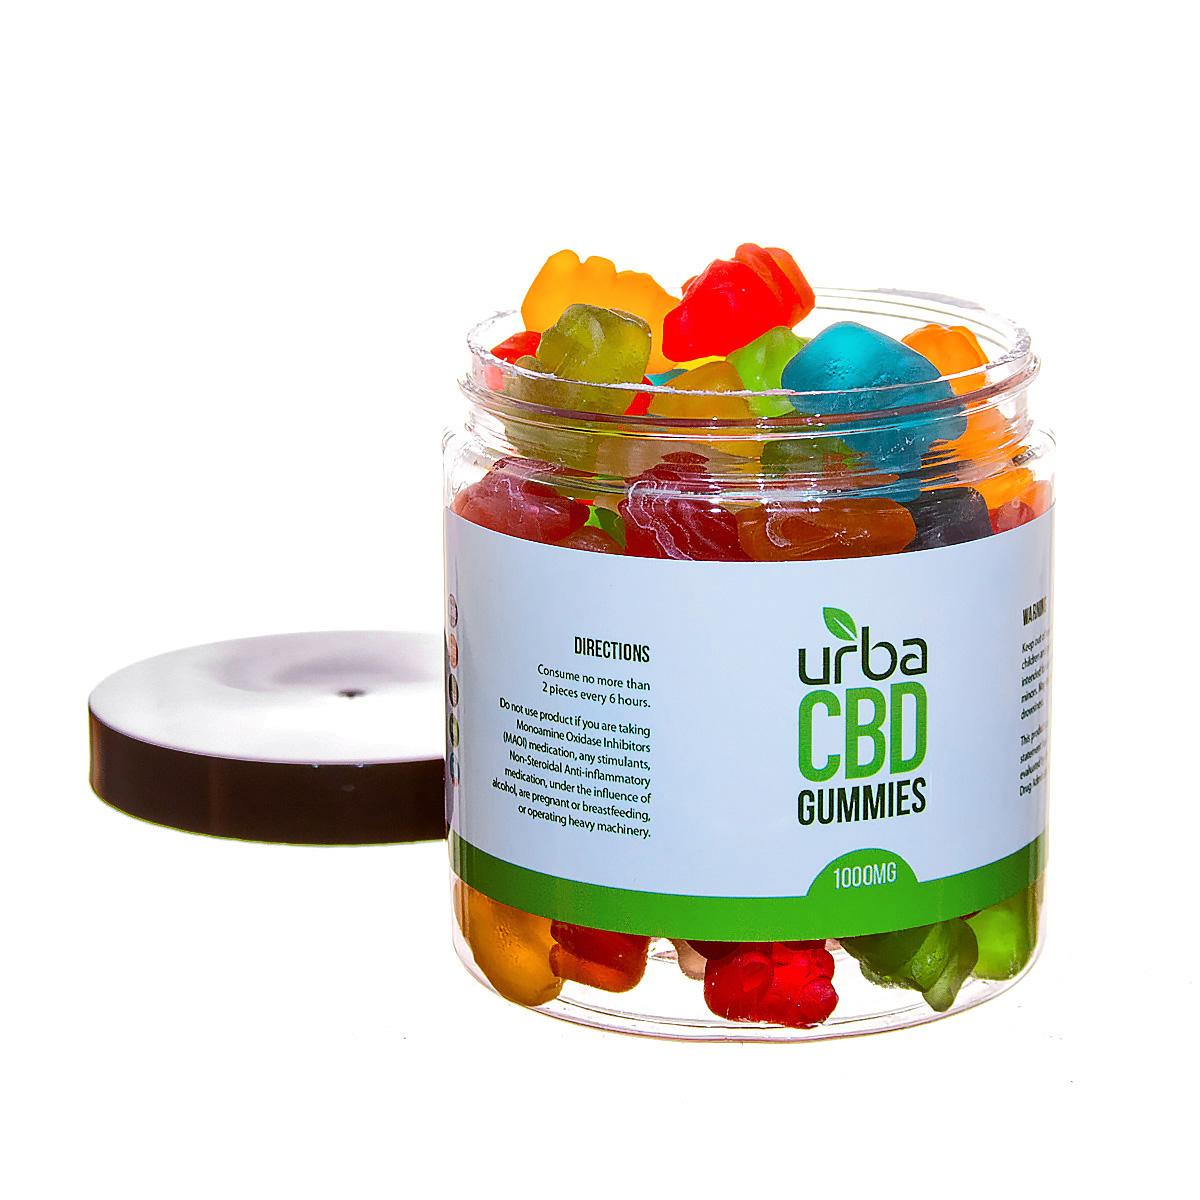 Urba CBD Gummies Bears 1000mg